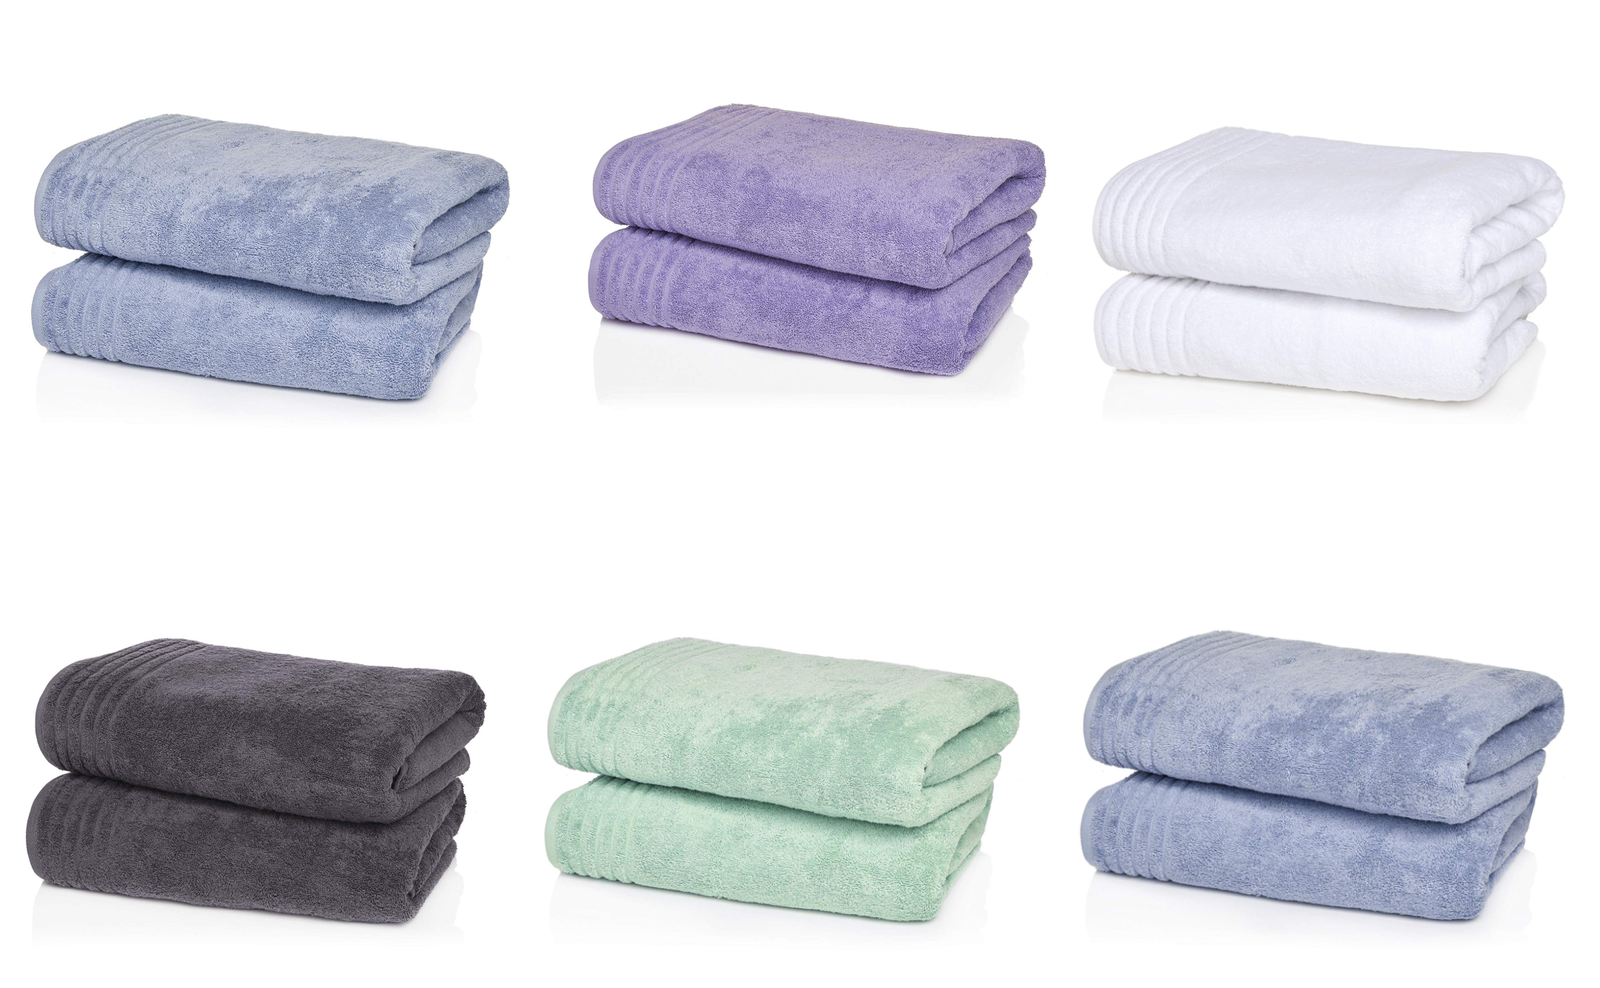 4 bright white hotel bath towels large 30x60 turkish supreme 100/% cotton soft